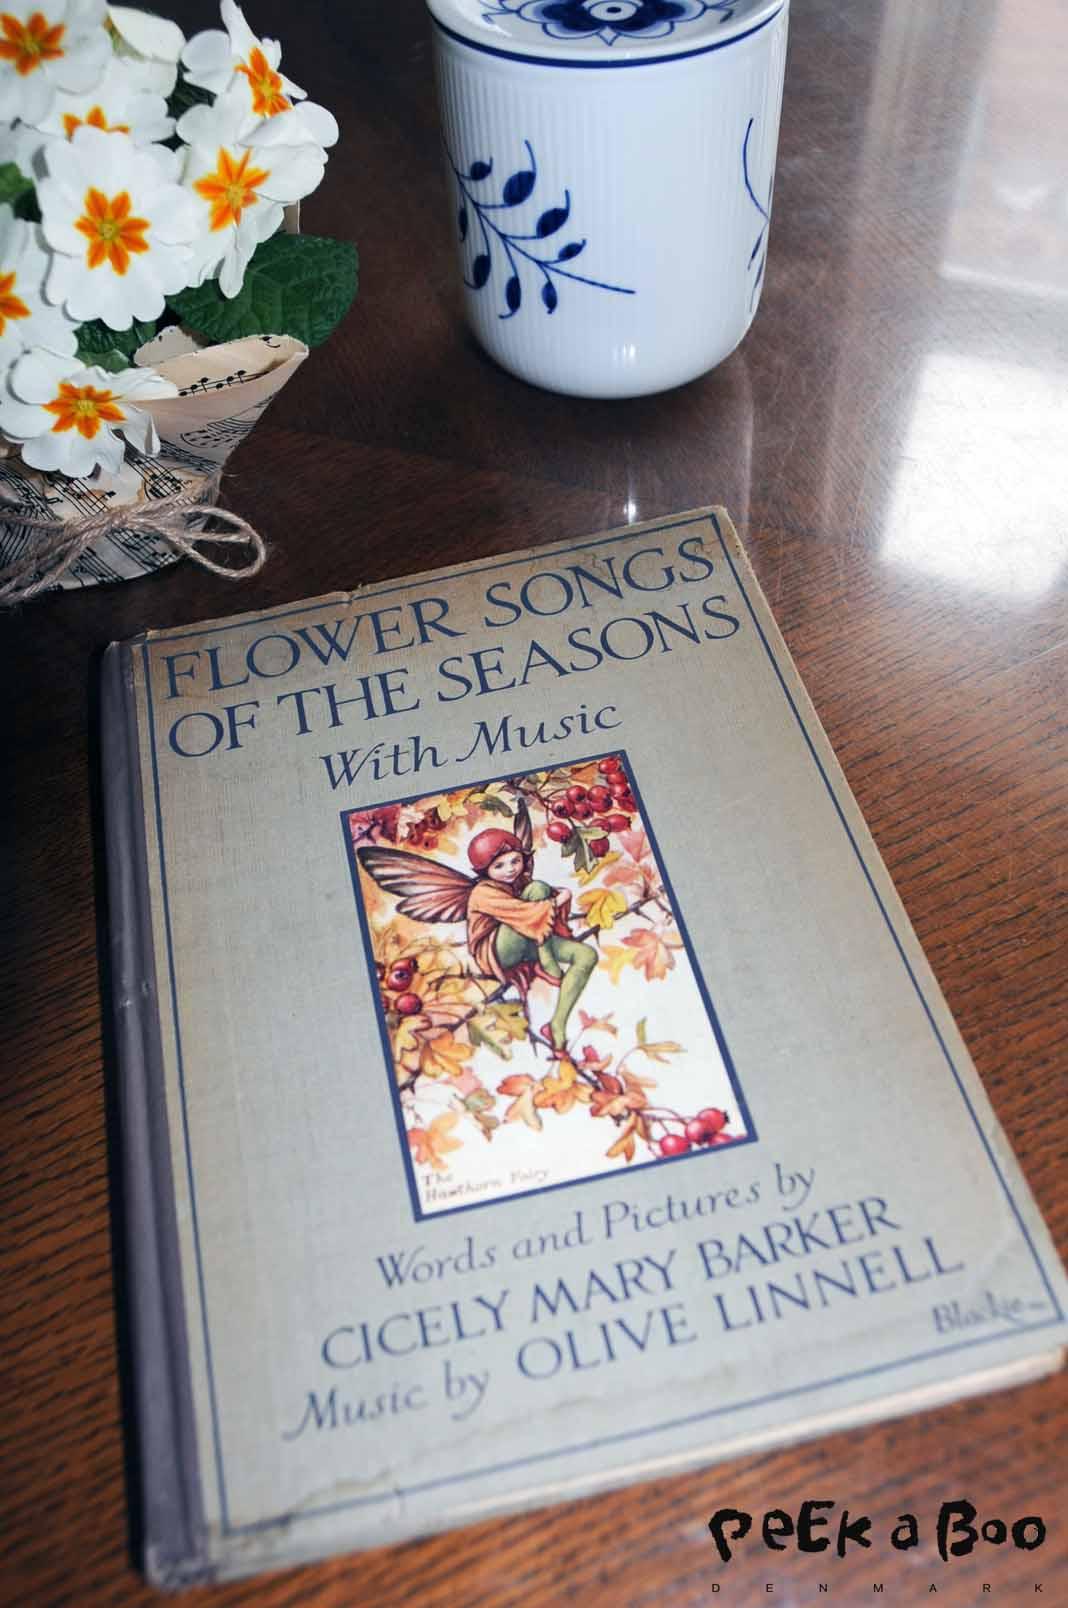 Flower songa of the seasons....I love it !